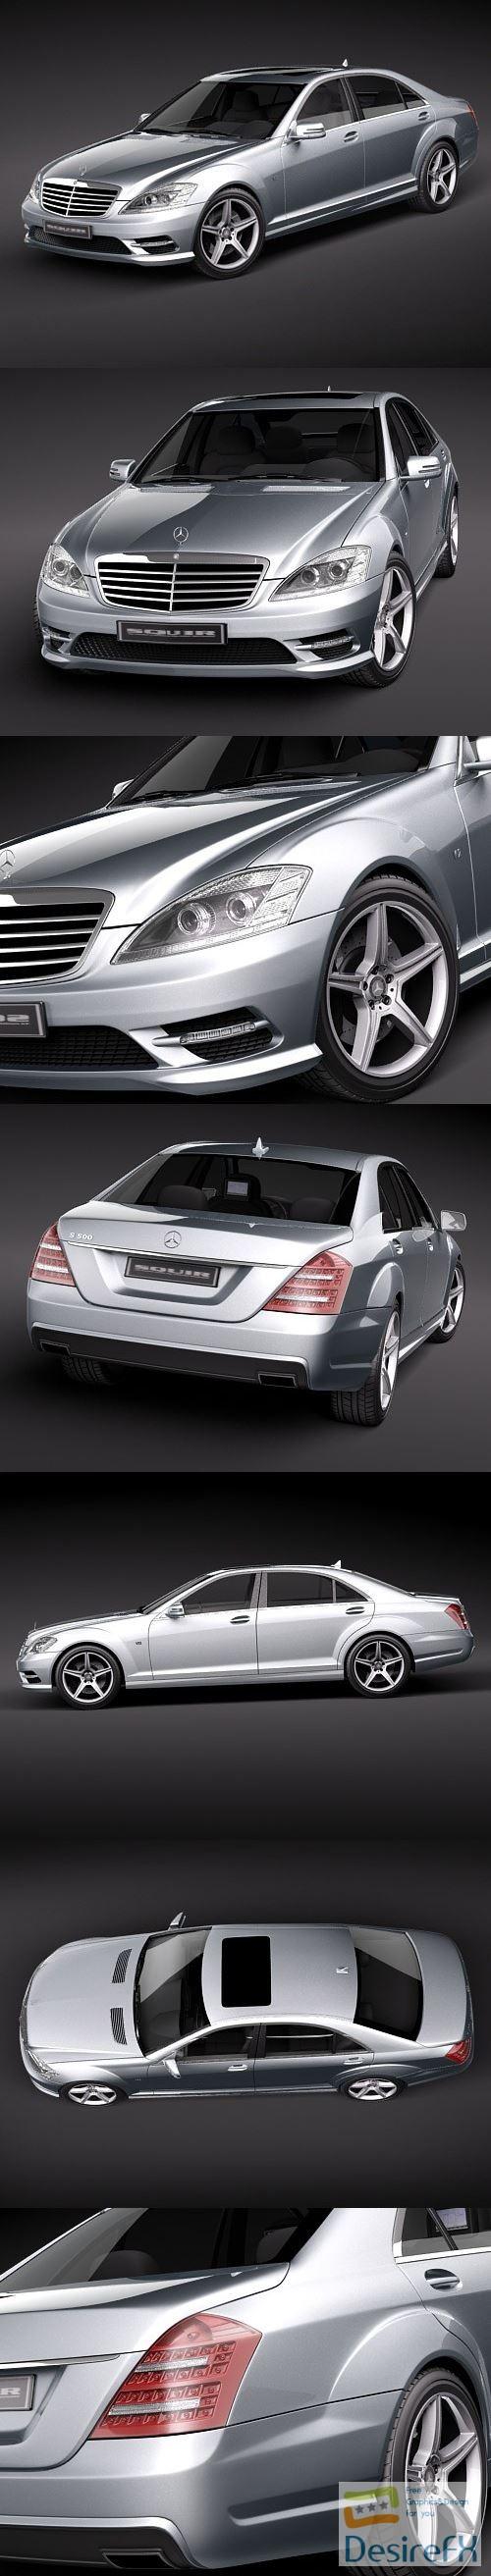 Mercedes-Benz S-Class AMG 2010 3D Model